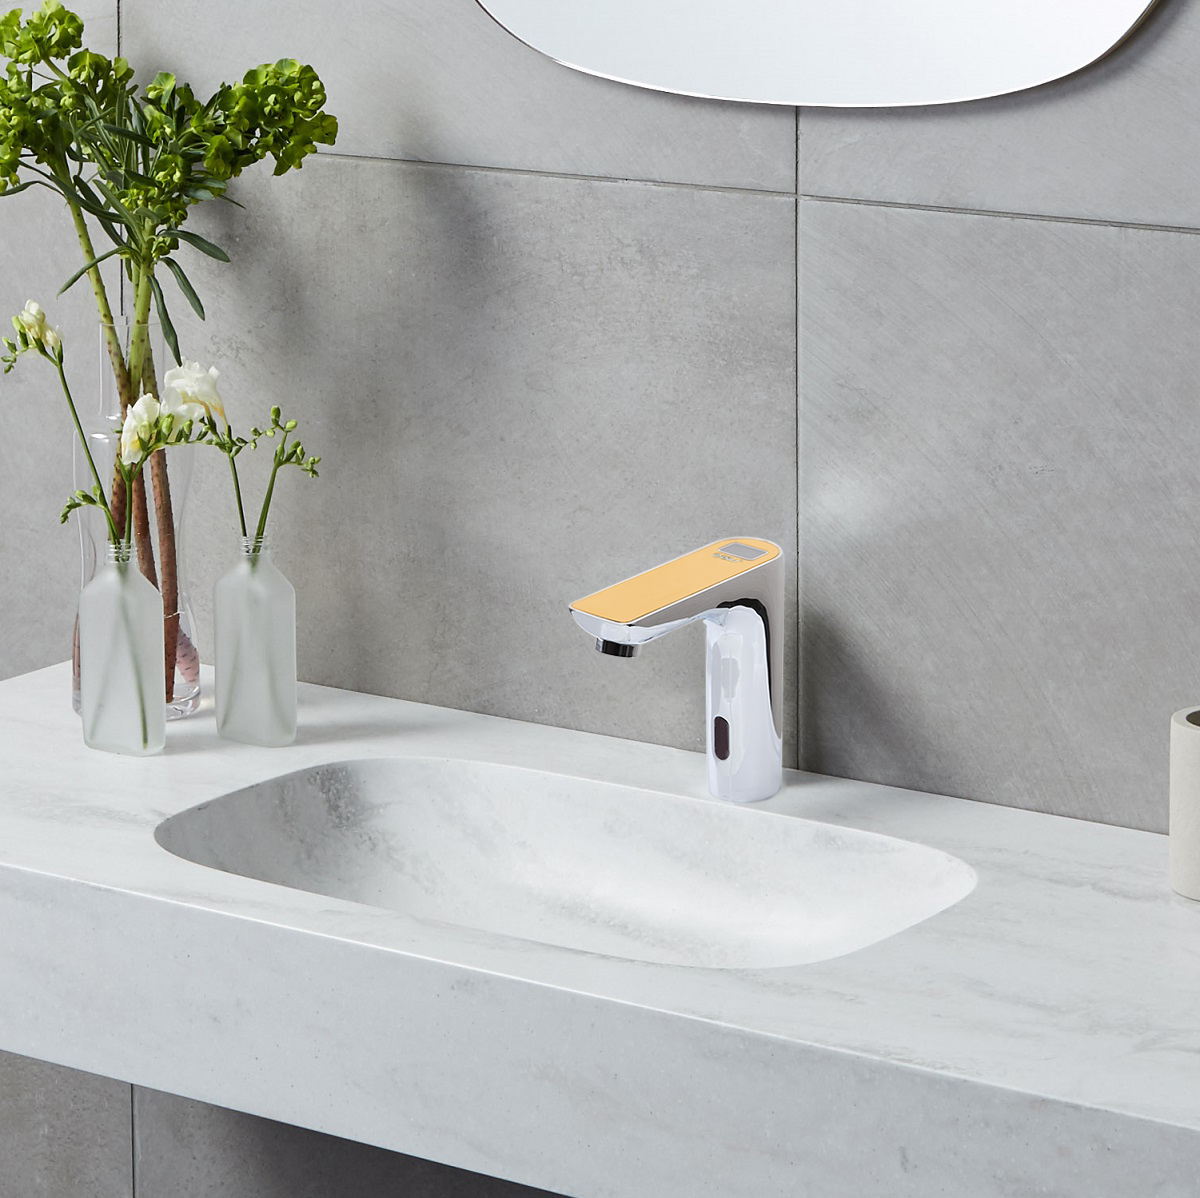 Milan Juno Digital Display Commercial Automatic Motion Sensor Faucet